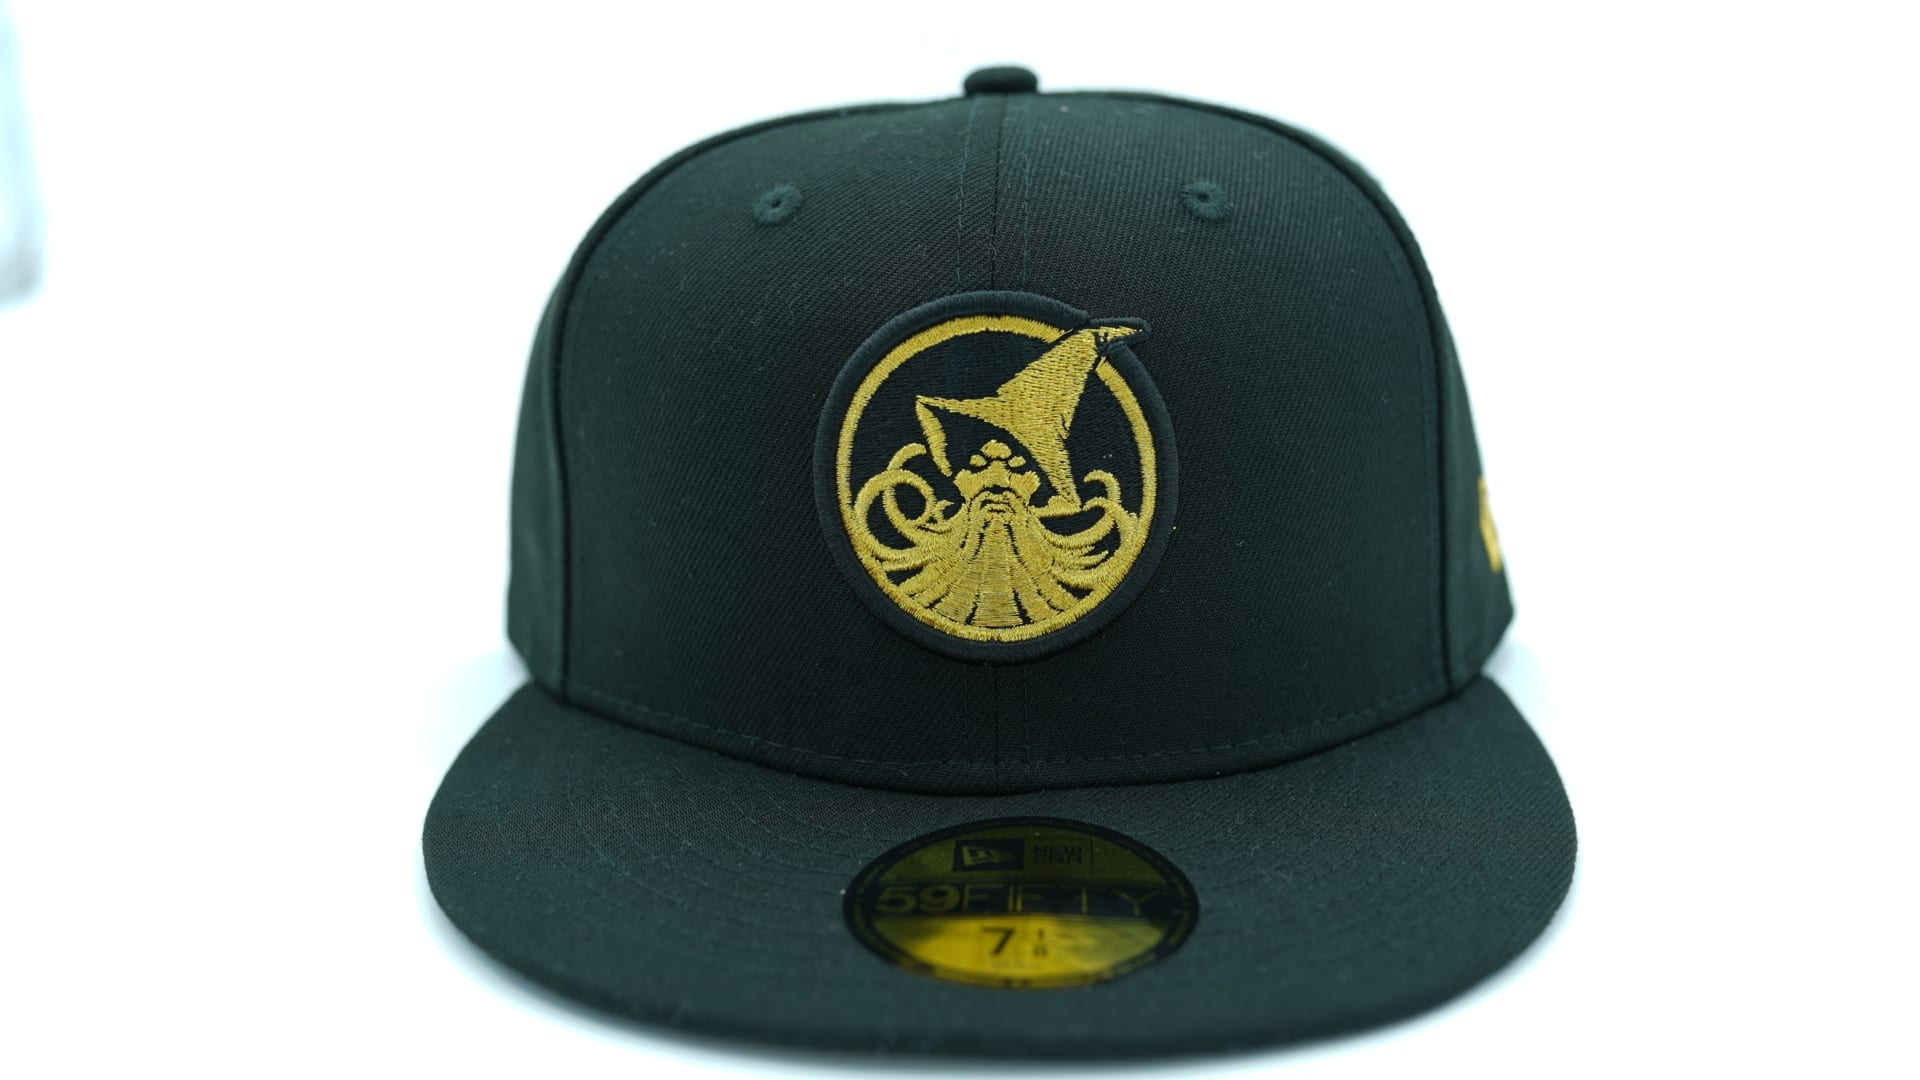 death adder black fur 59fifty fitted baseball cap mishka new era